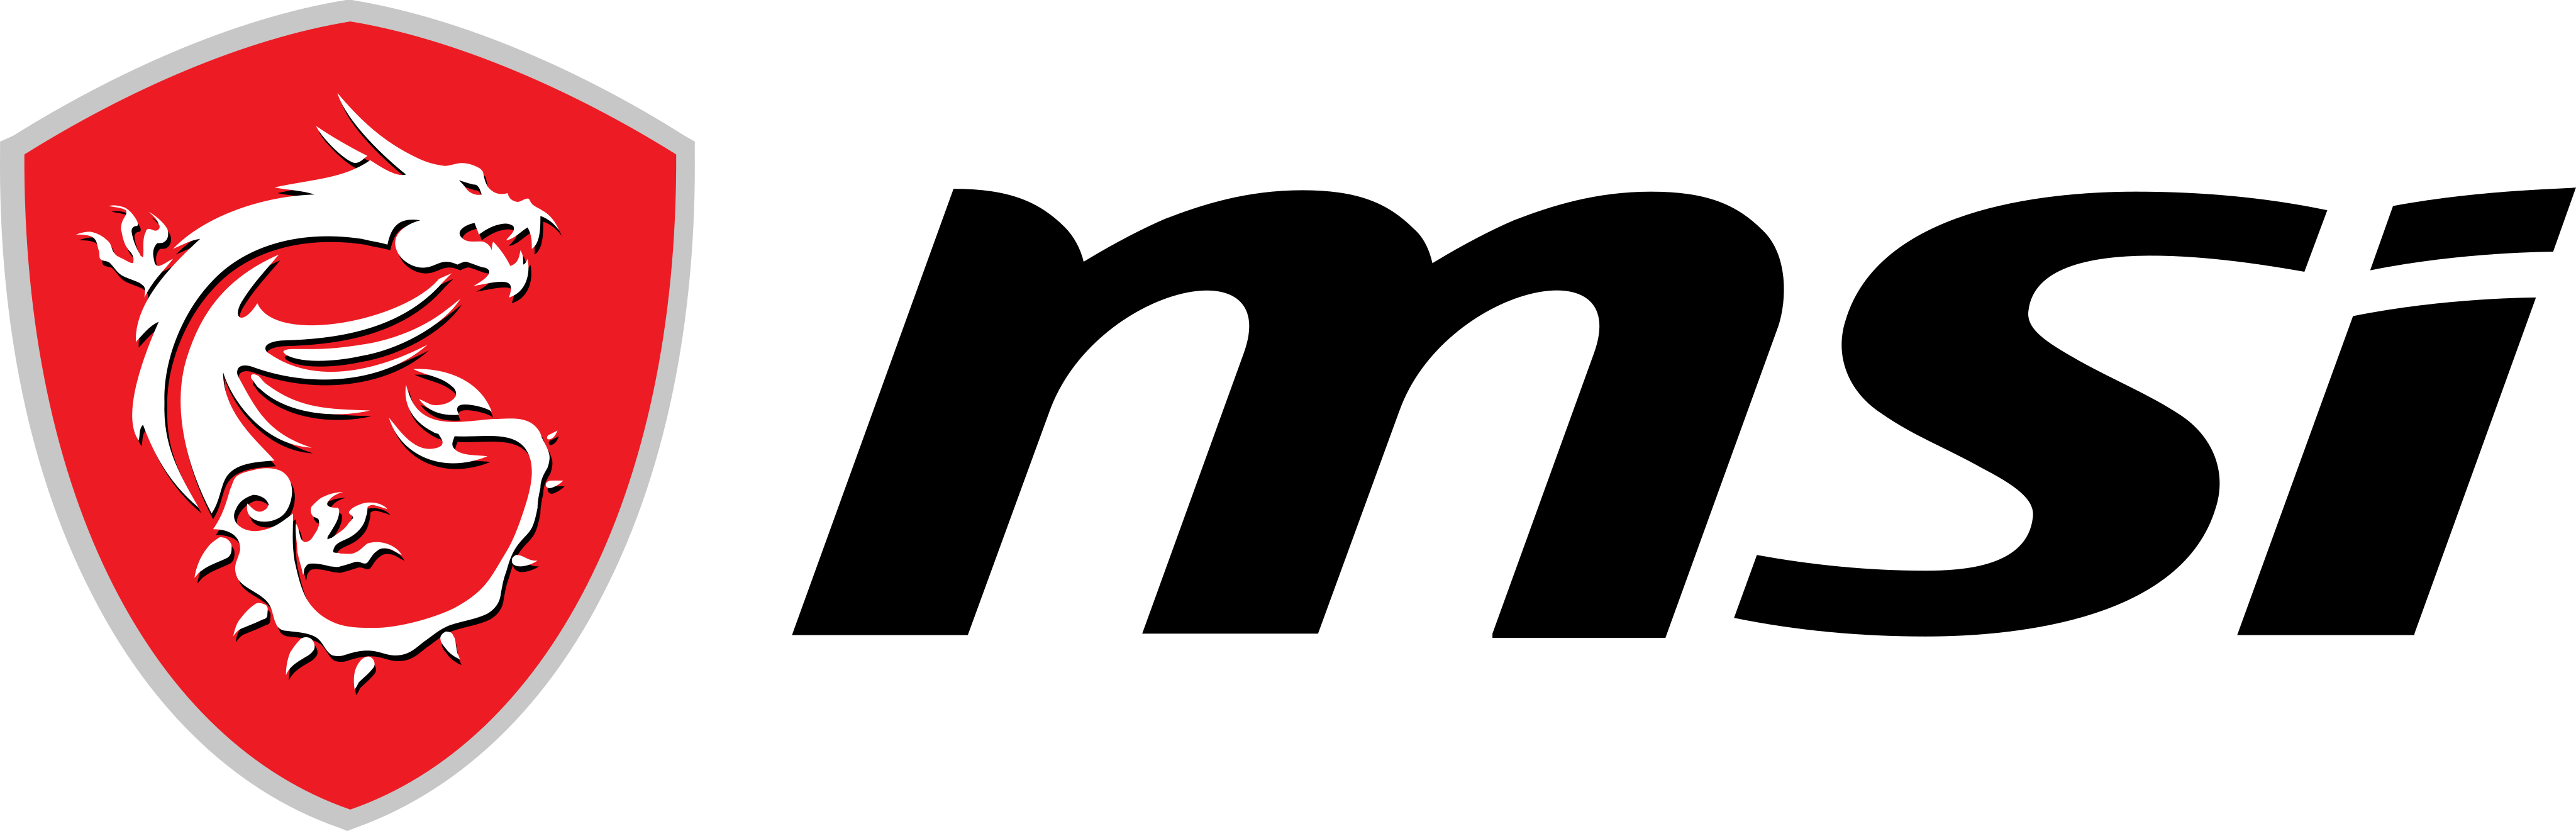 msi logo 1 - MSI Logo